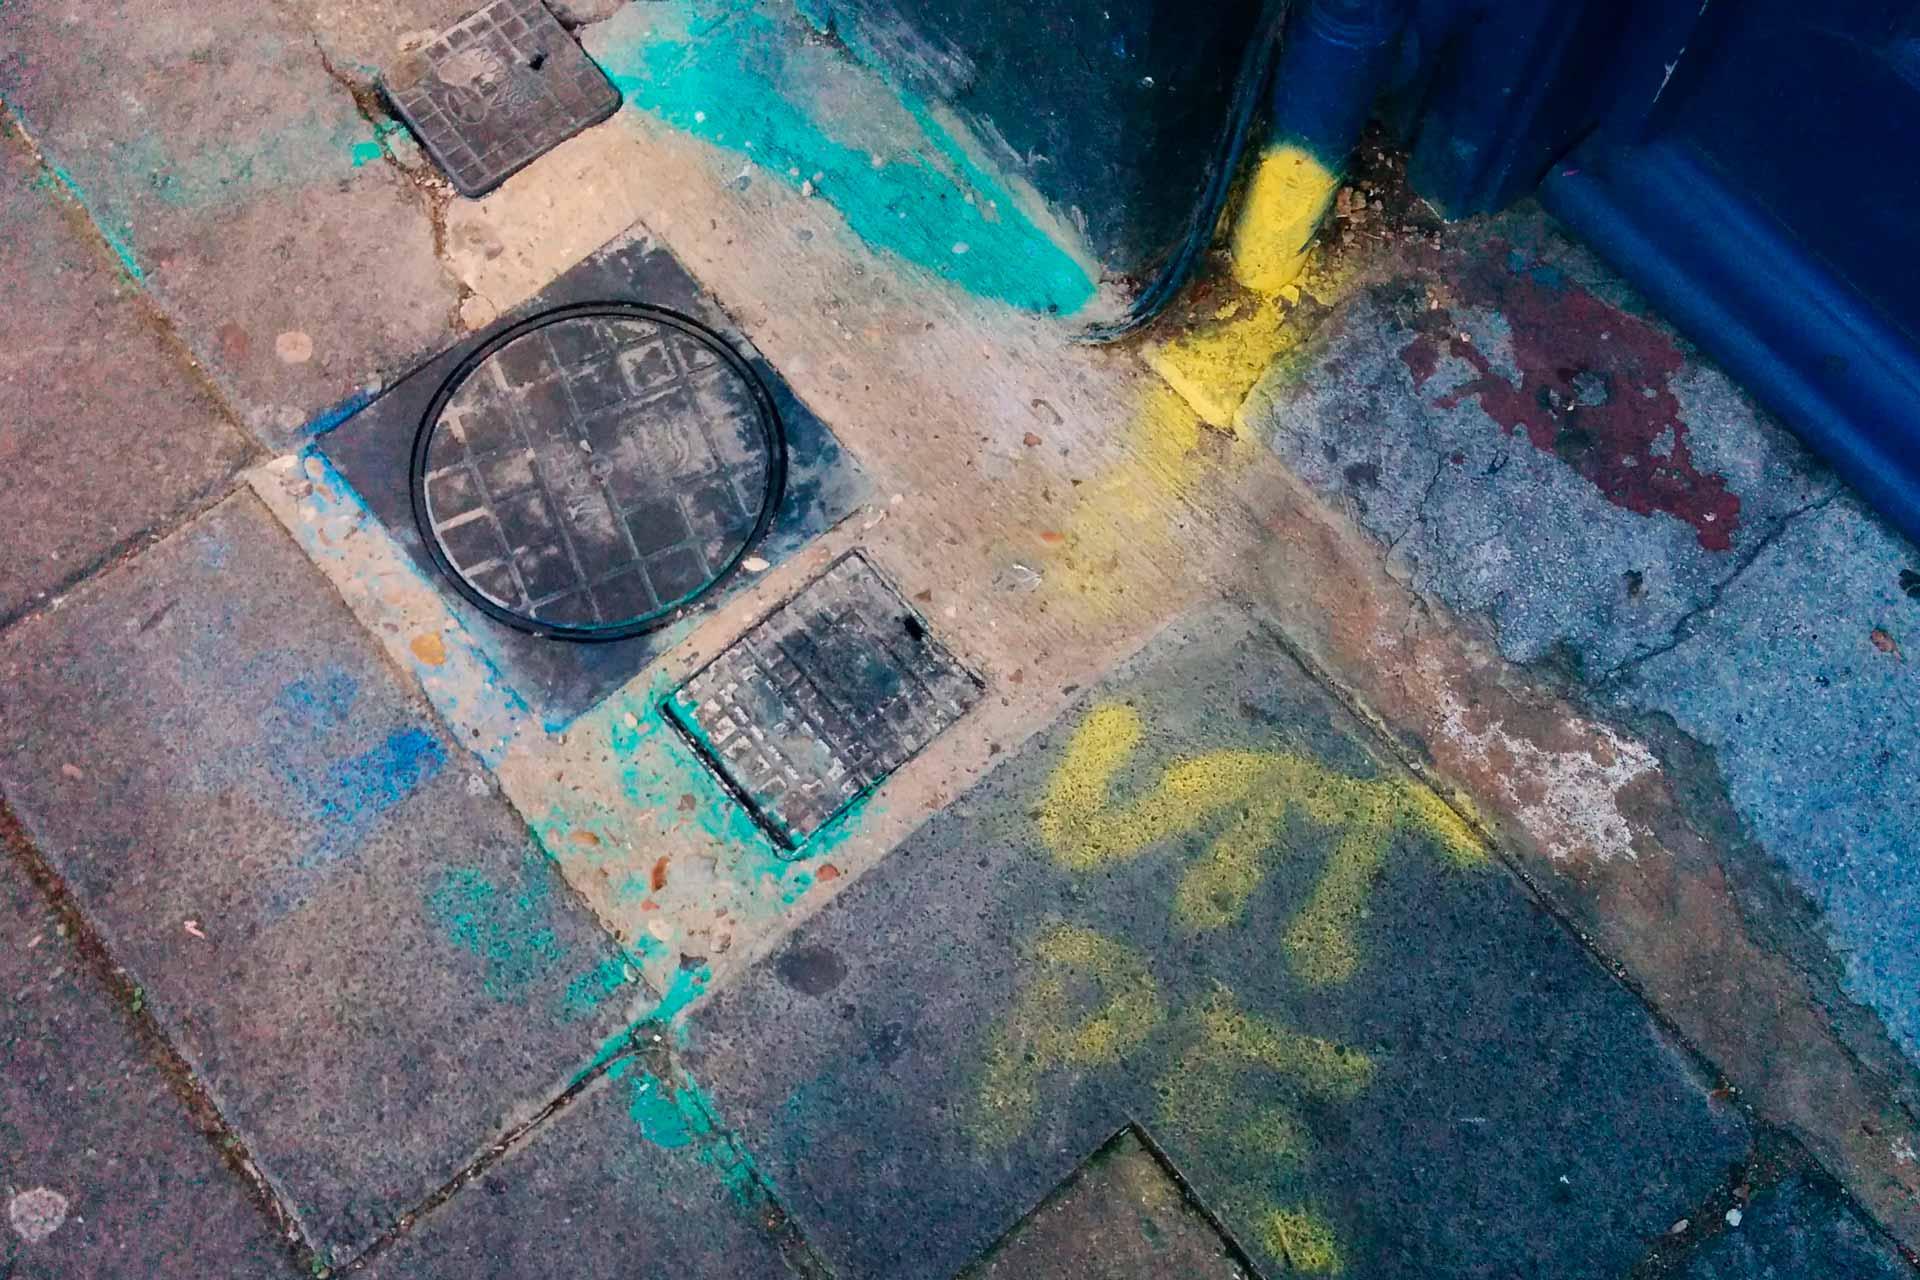 Street-markings_image05